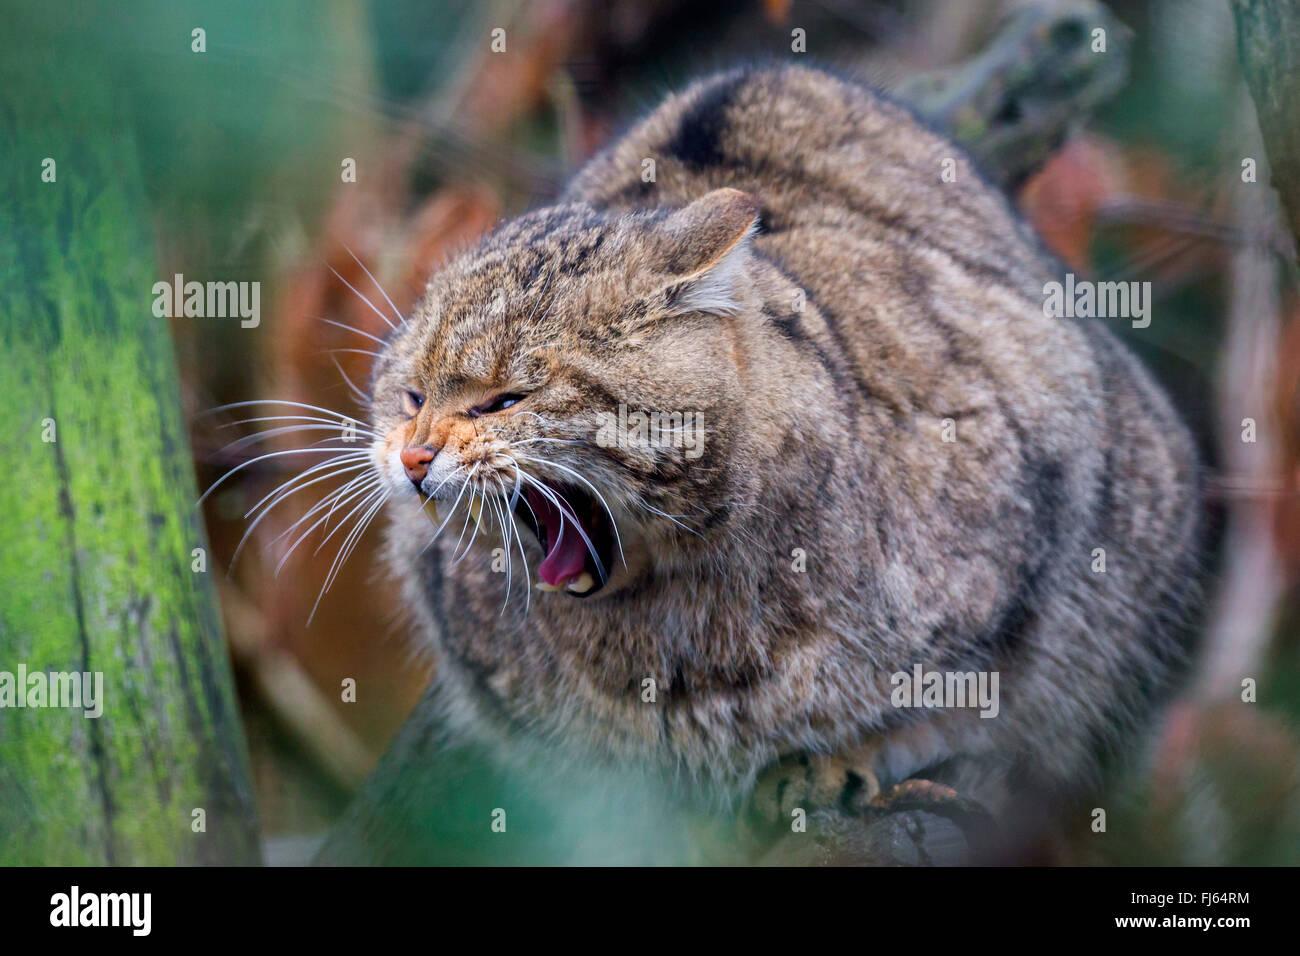 European wildcat, forest wildcat (Felis silvestris silvestris), sits on a tree yawning - Stock Image